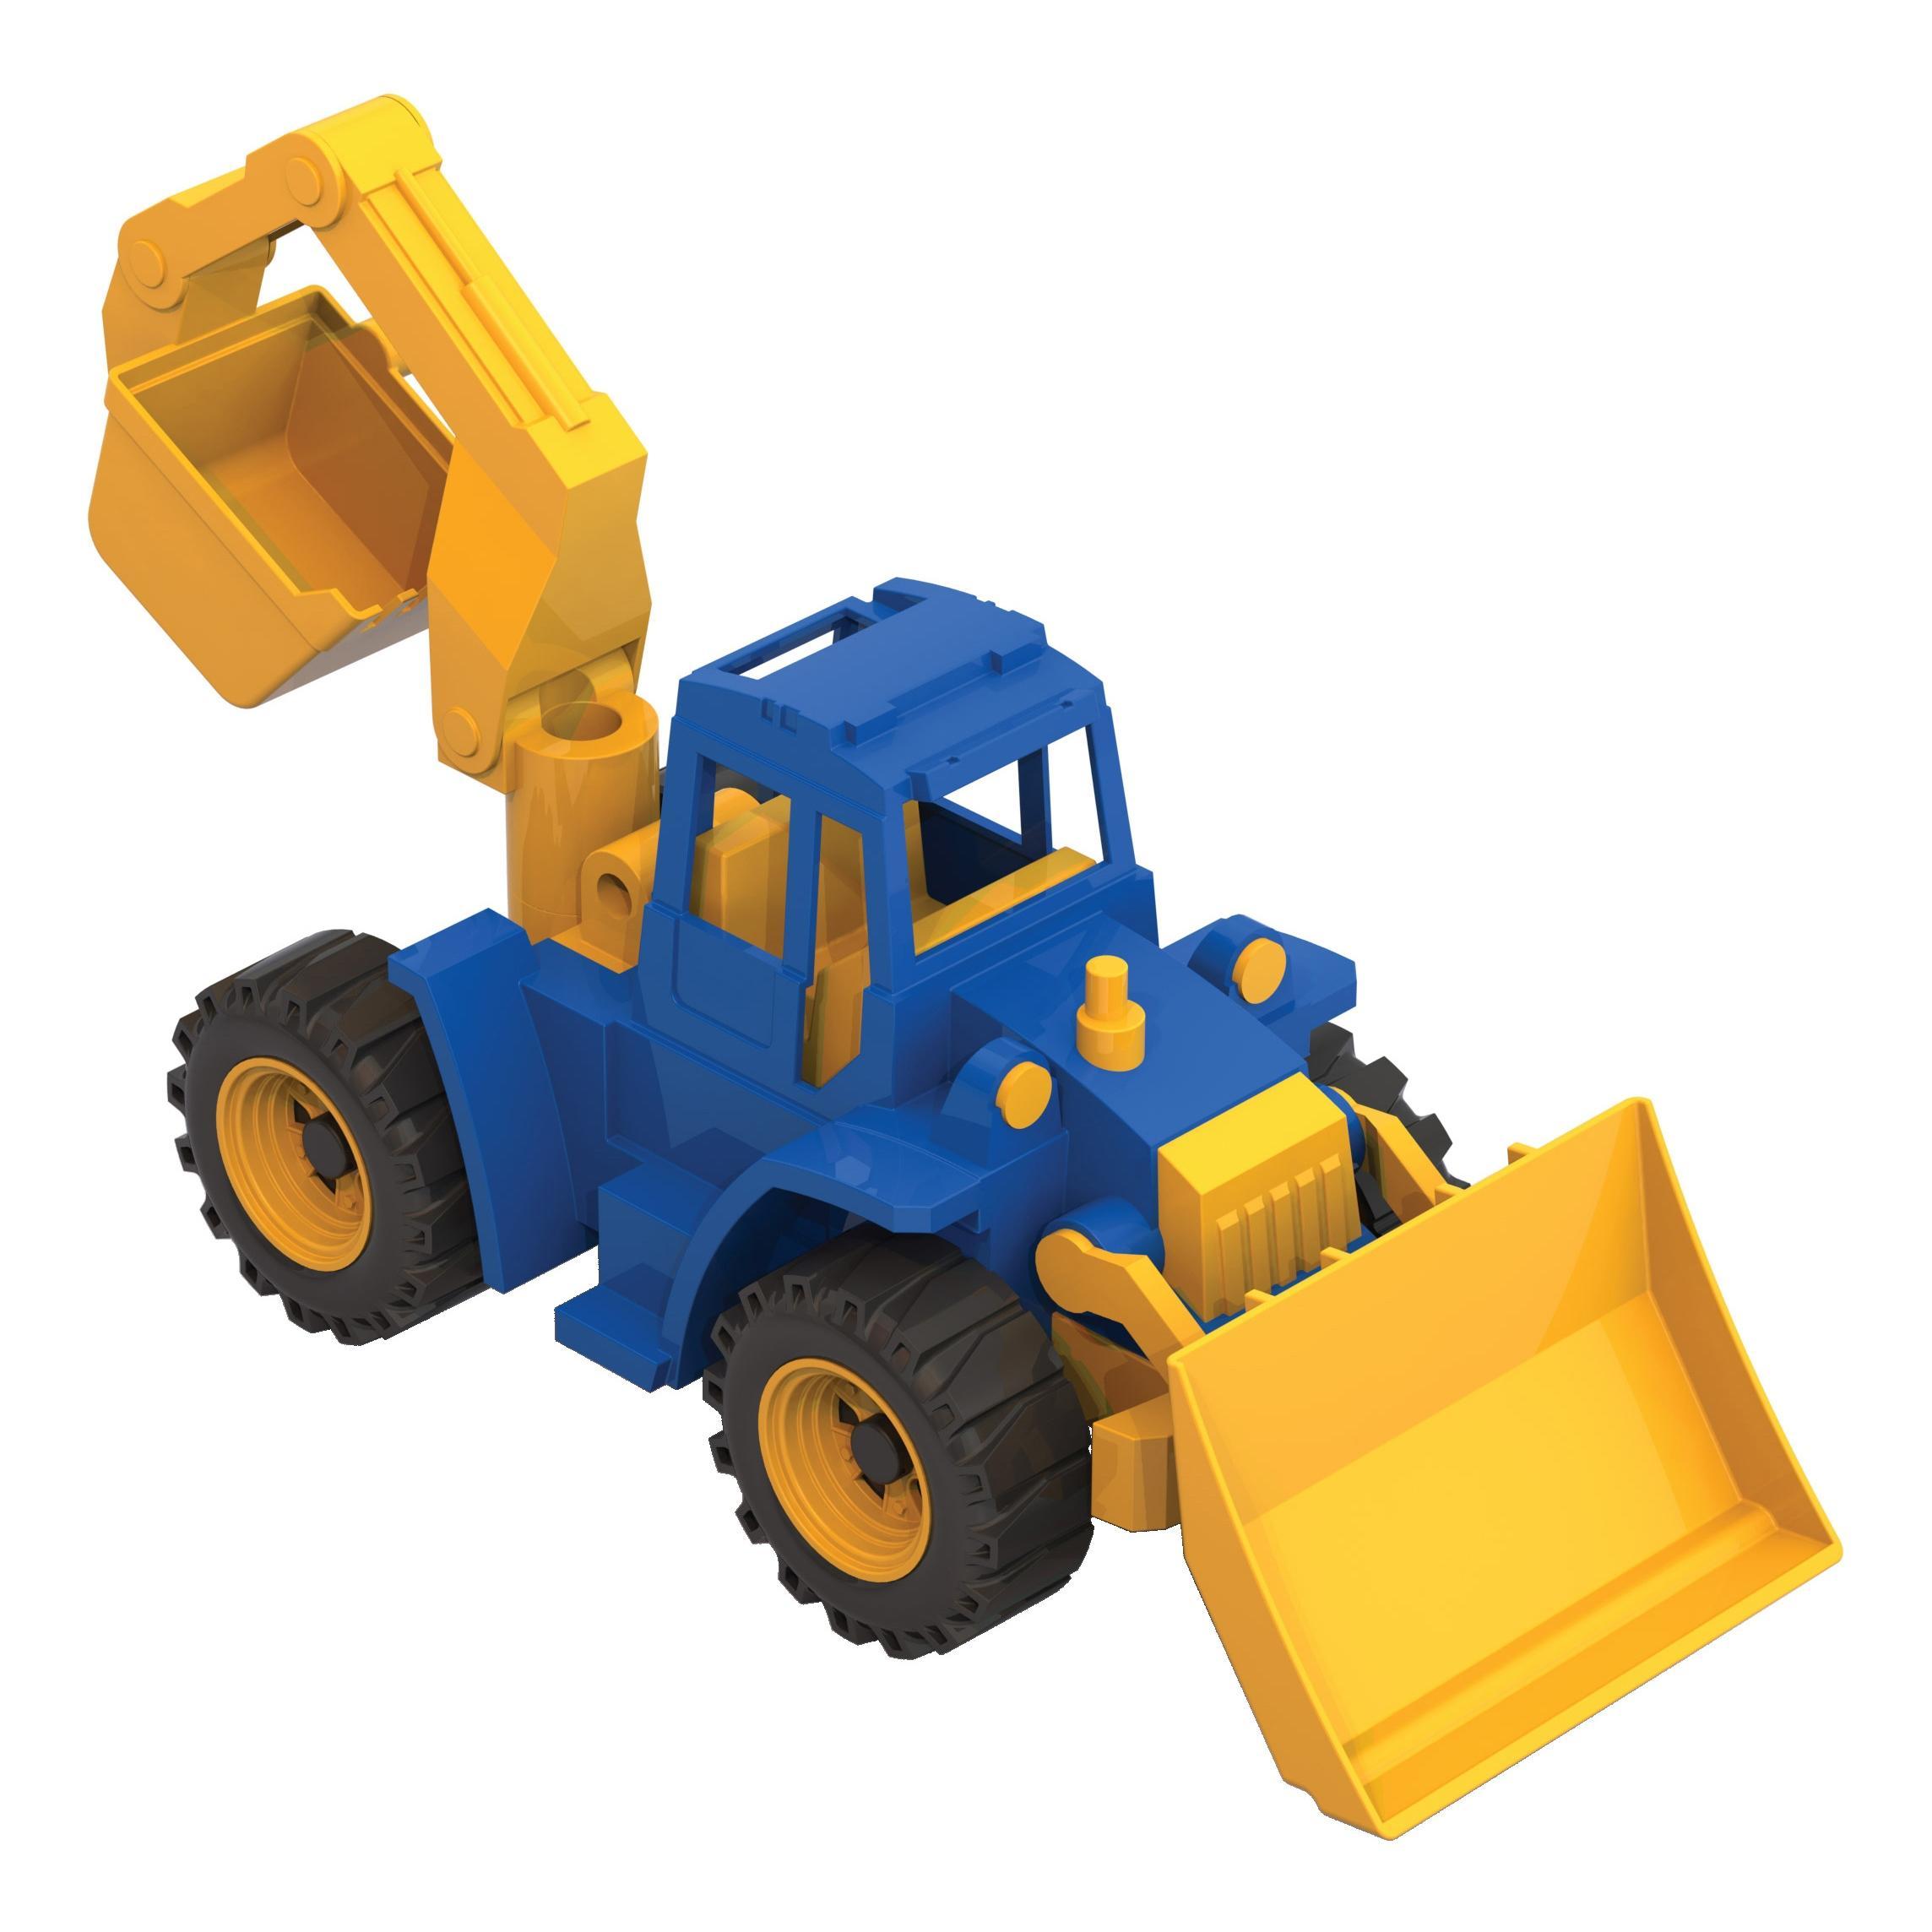 Трактор Нордпласт Ангара с грейдером и ковшом фото